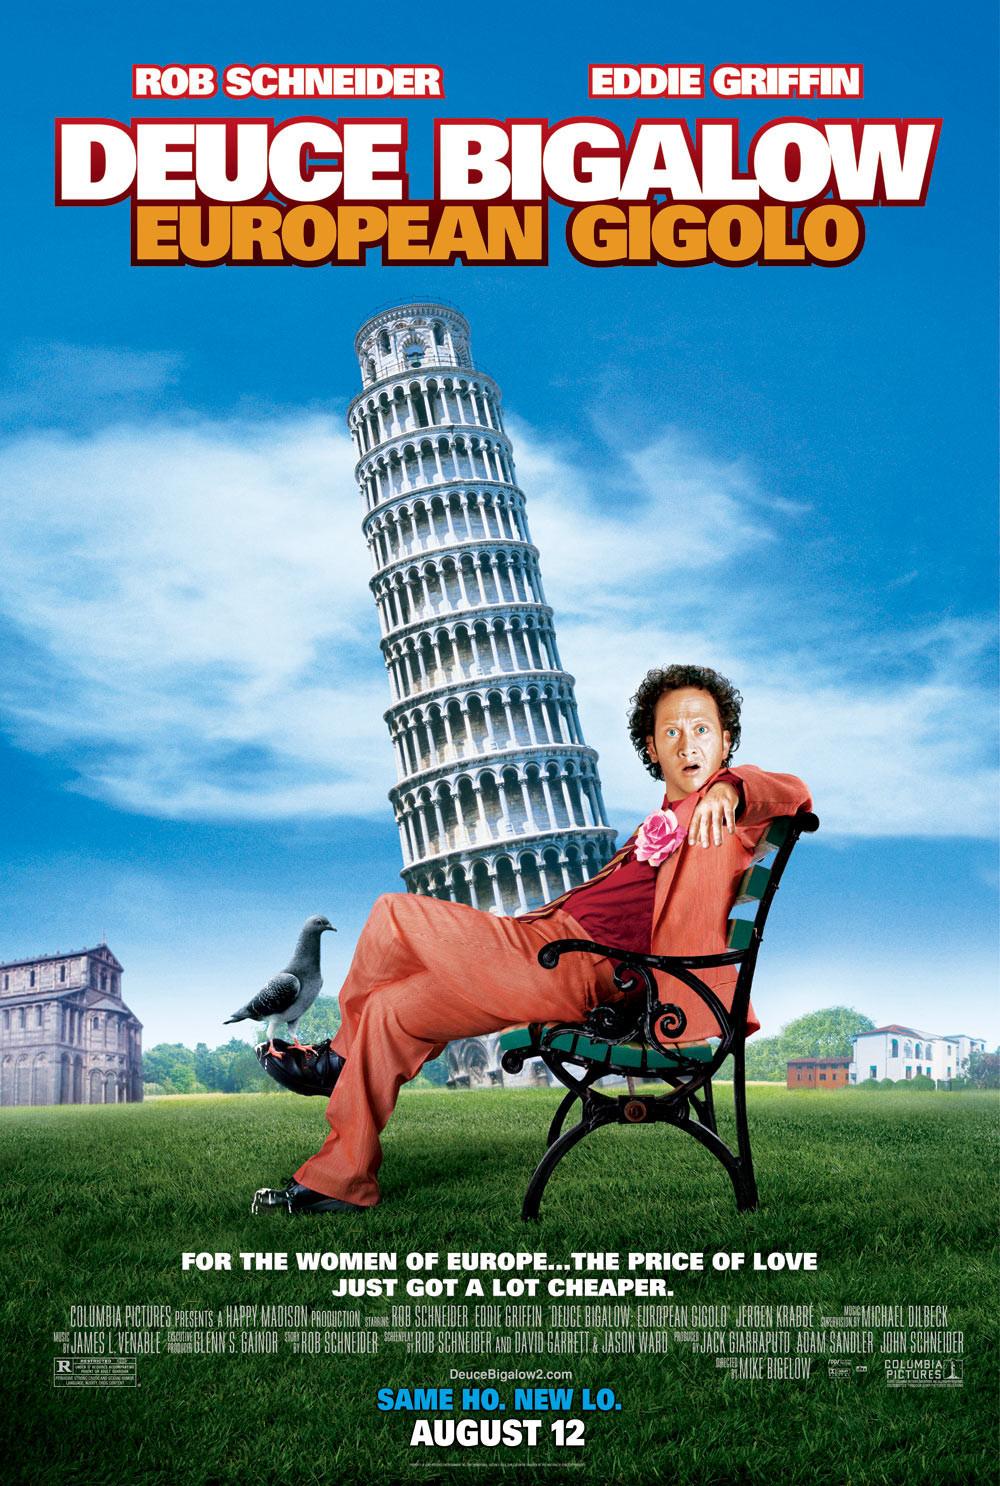 Deuce Bigalow II : European Gigolo / Дюс Бигалоу 2 : Европейското жиголо (2005)